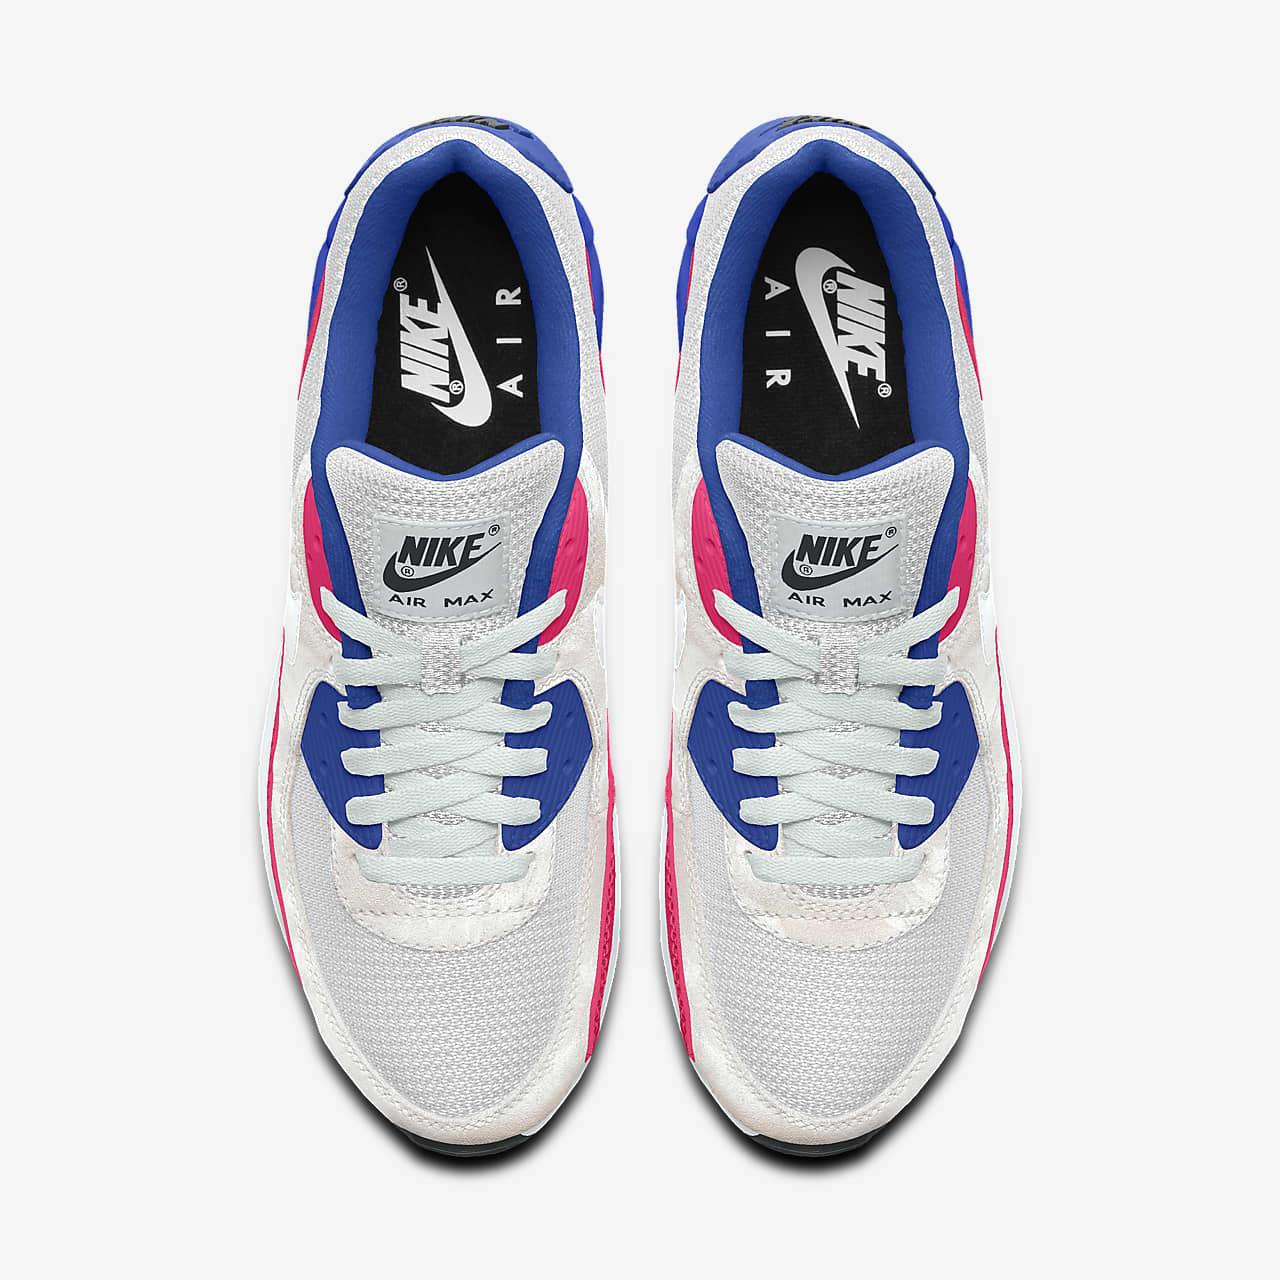 Nike Air Max 90 Unlocked By You Custom